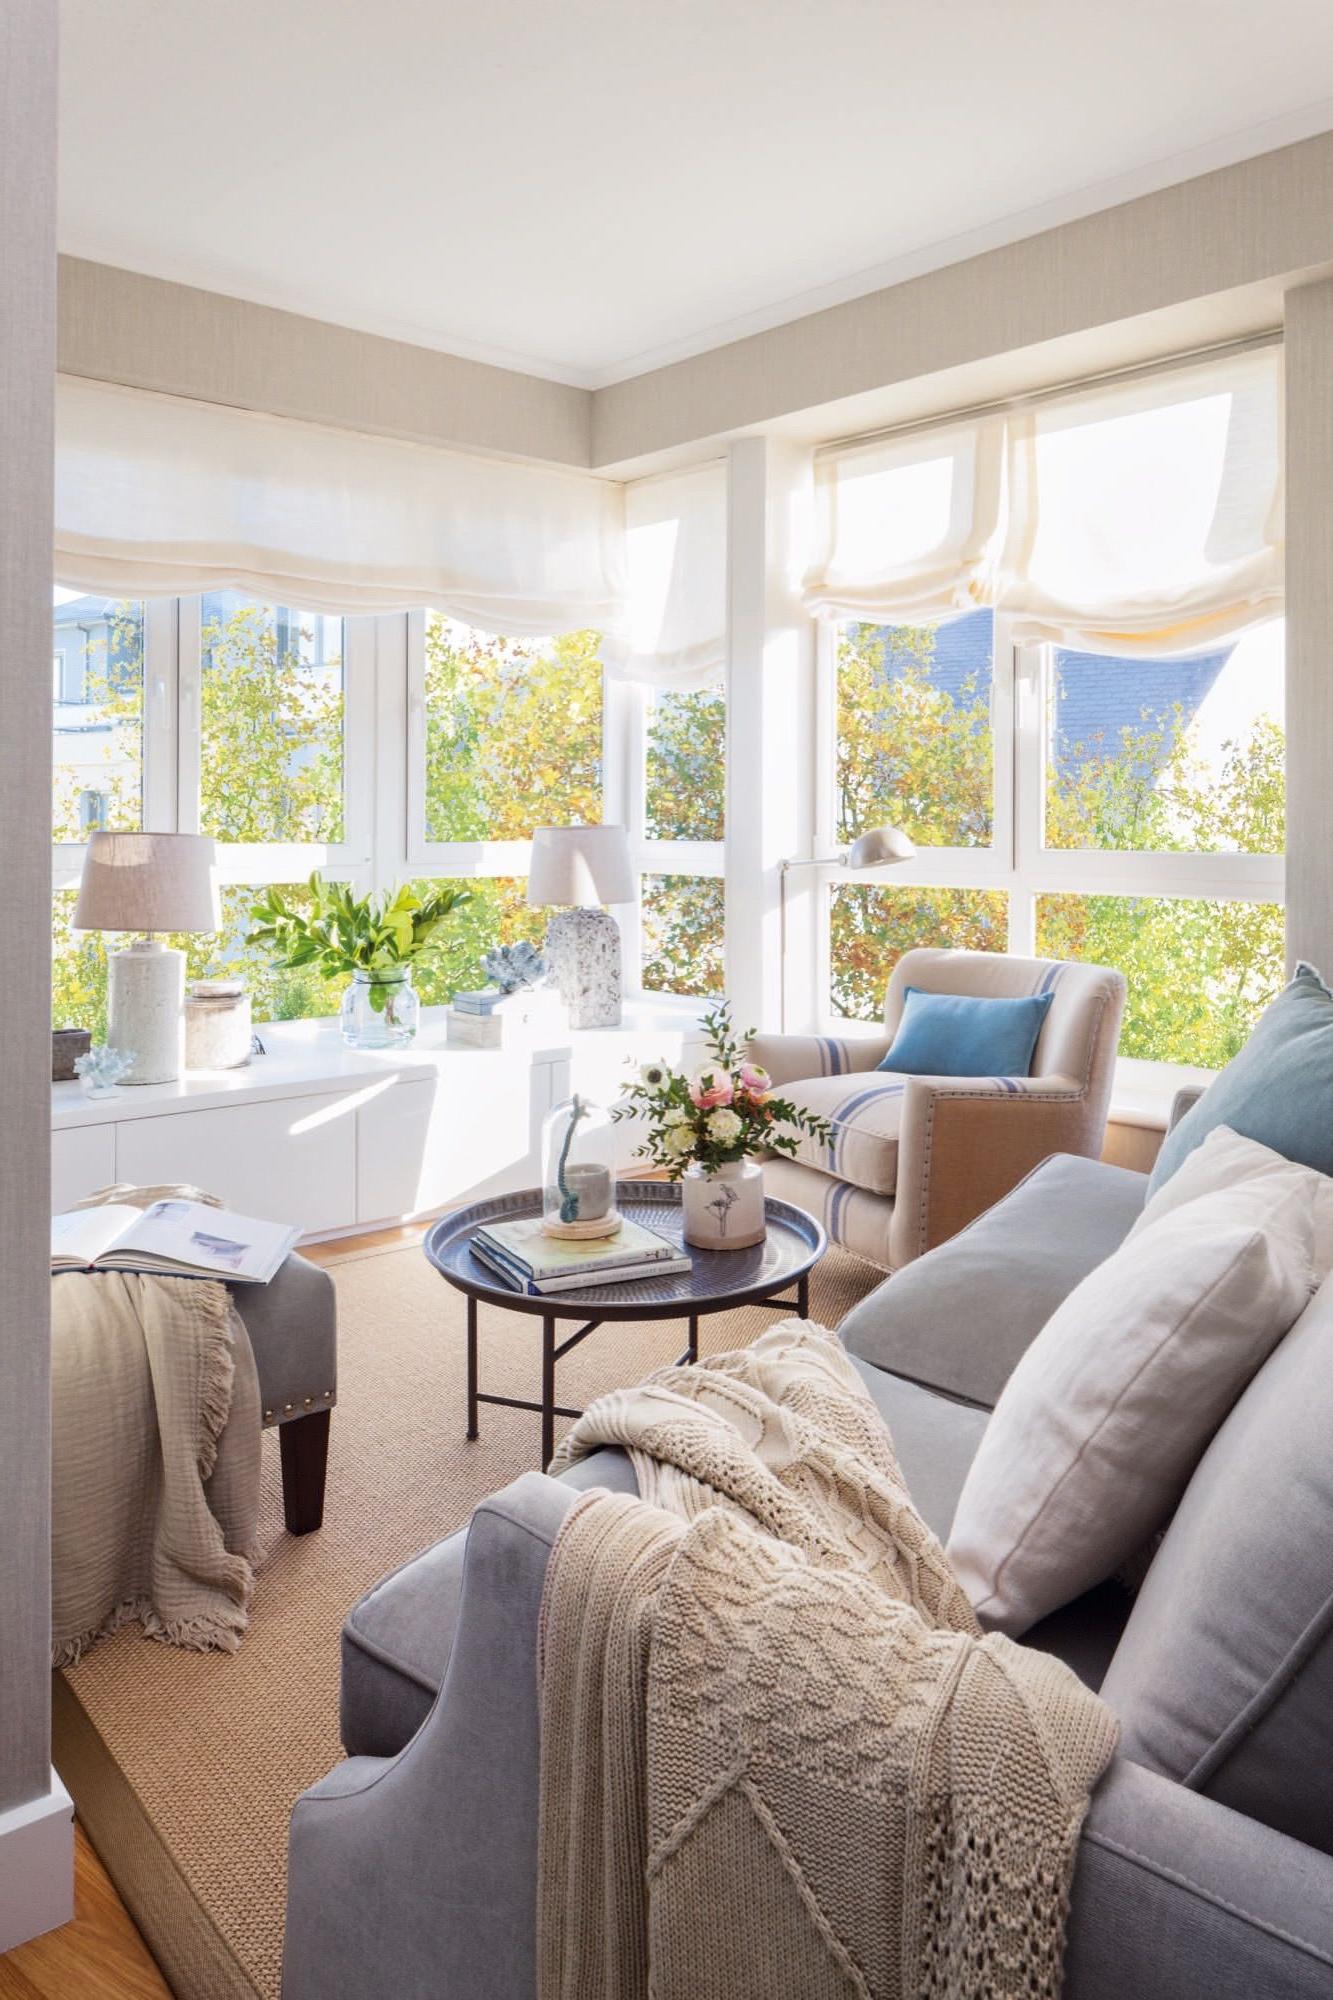 Revista El Mueble Salones 0gdr Un Minisalà N Con Mucha Luz Room Pinterest Living Room Room